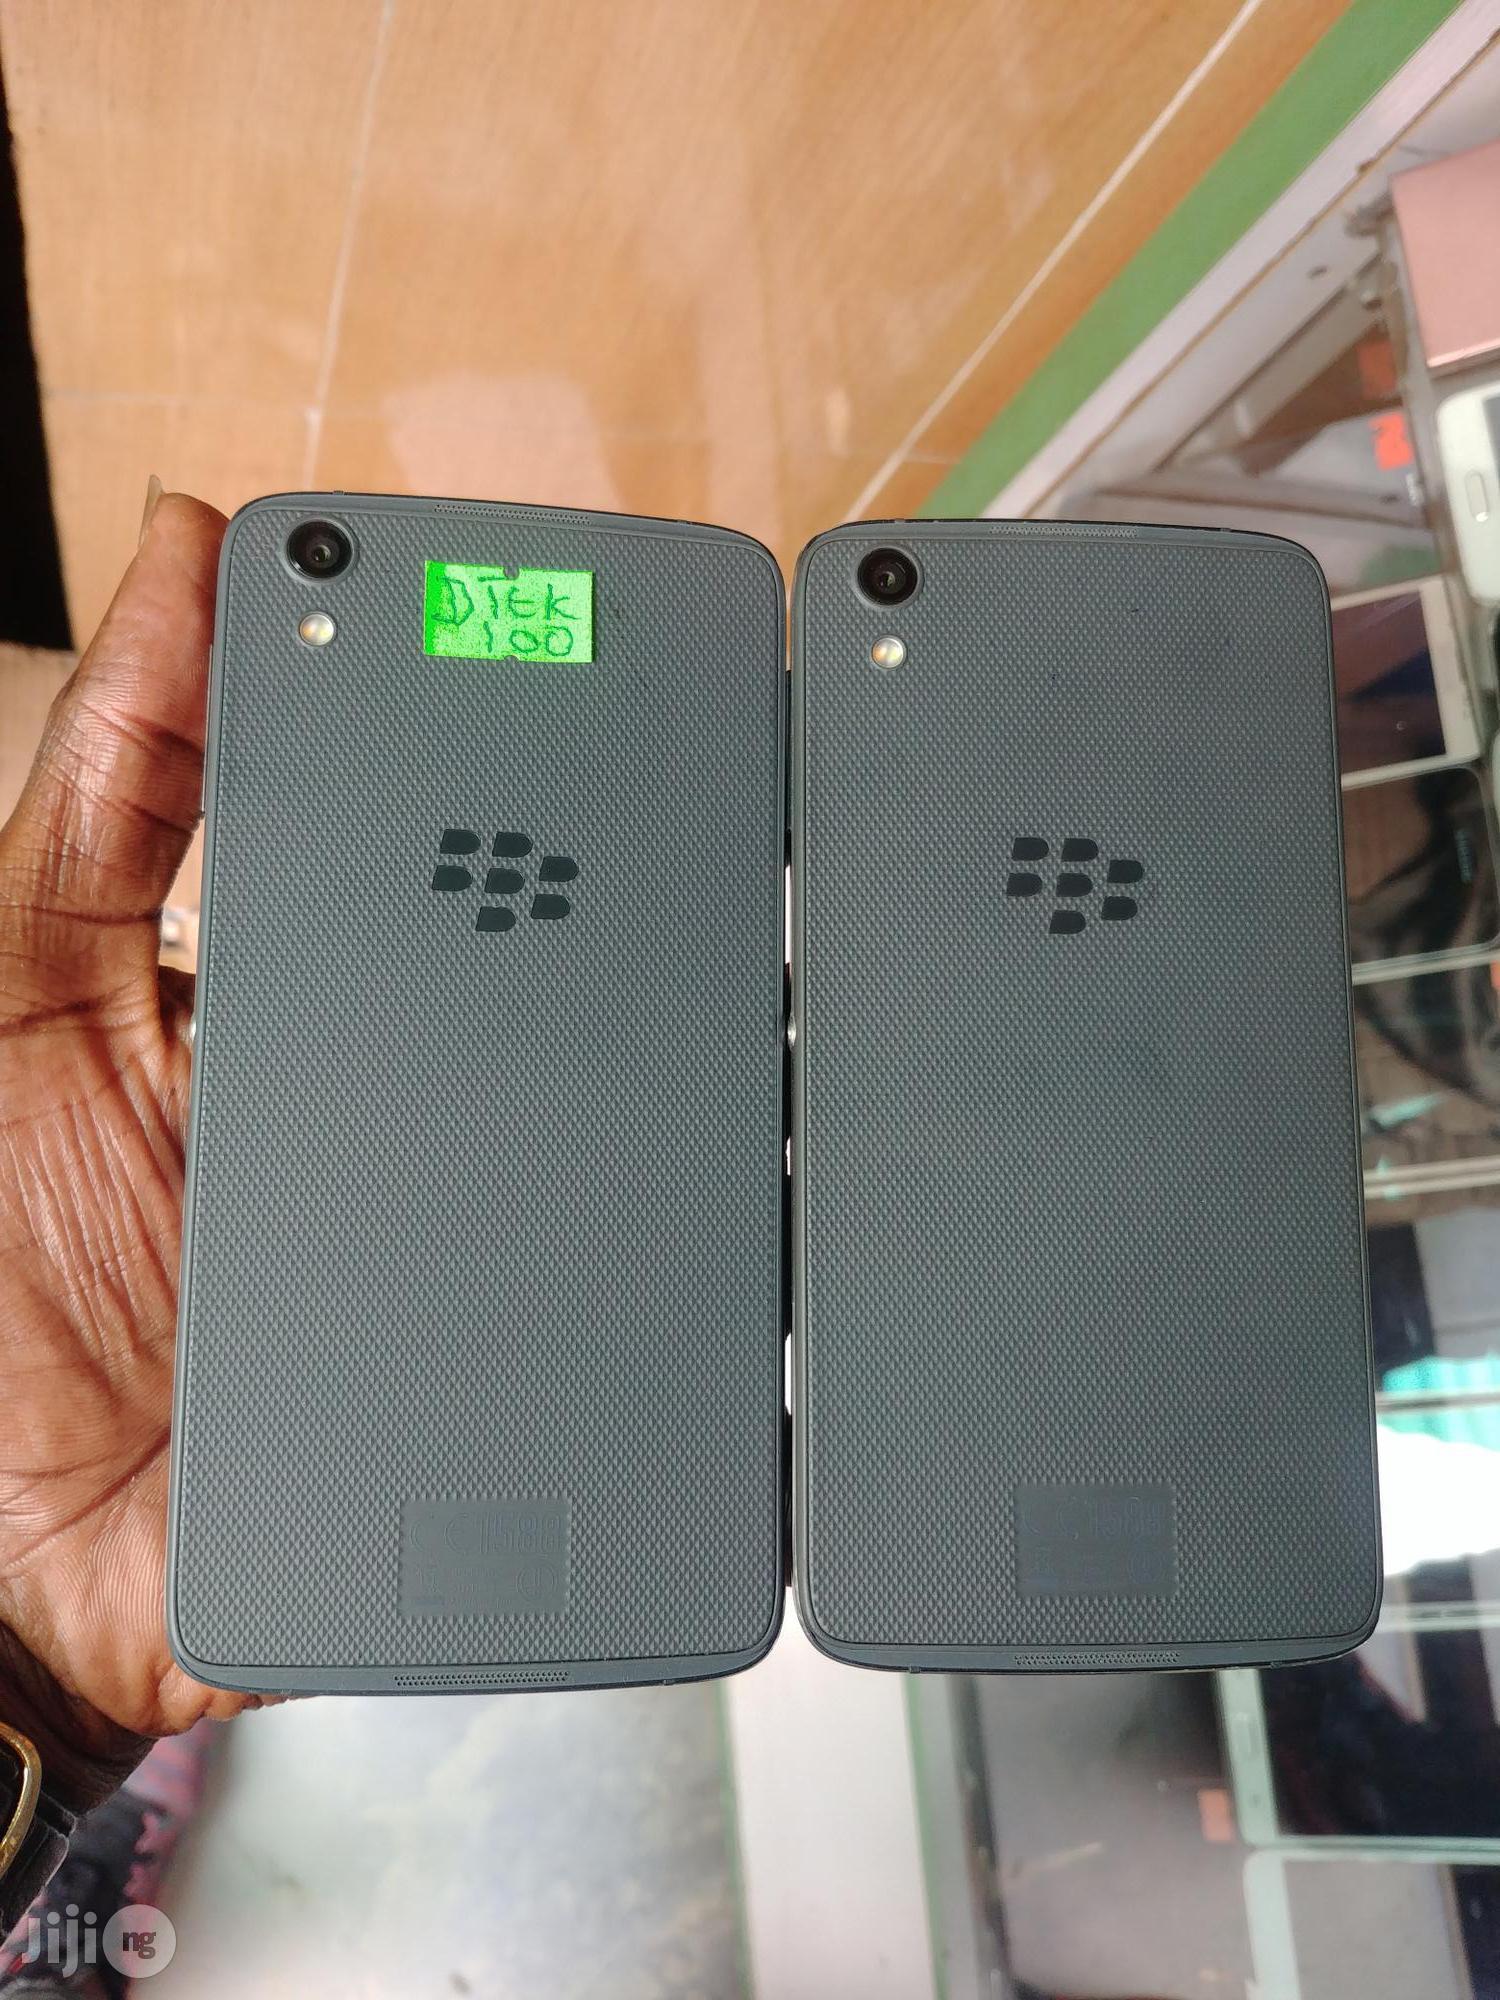 Blackberry Dtek 50 16GB For Sale | Mobile Phones for sale in Ikeja, Lagos State, Nigeria